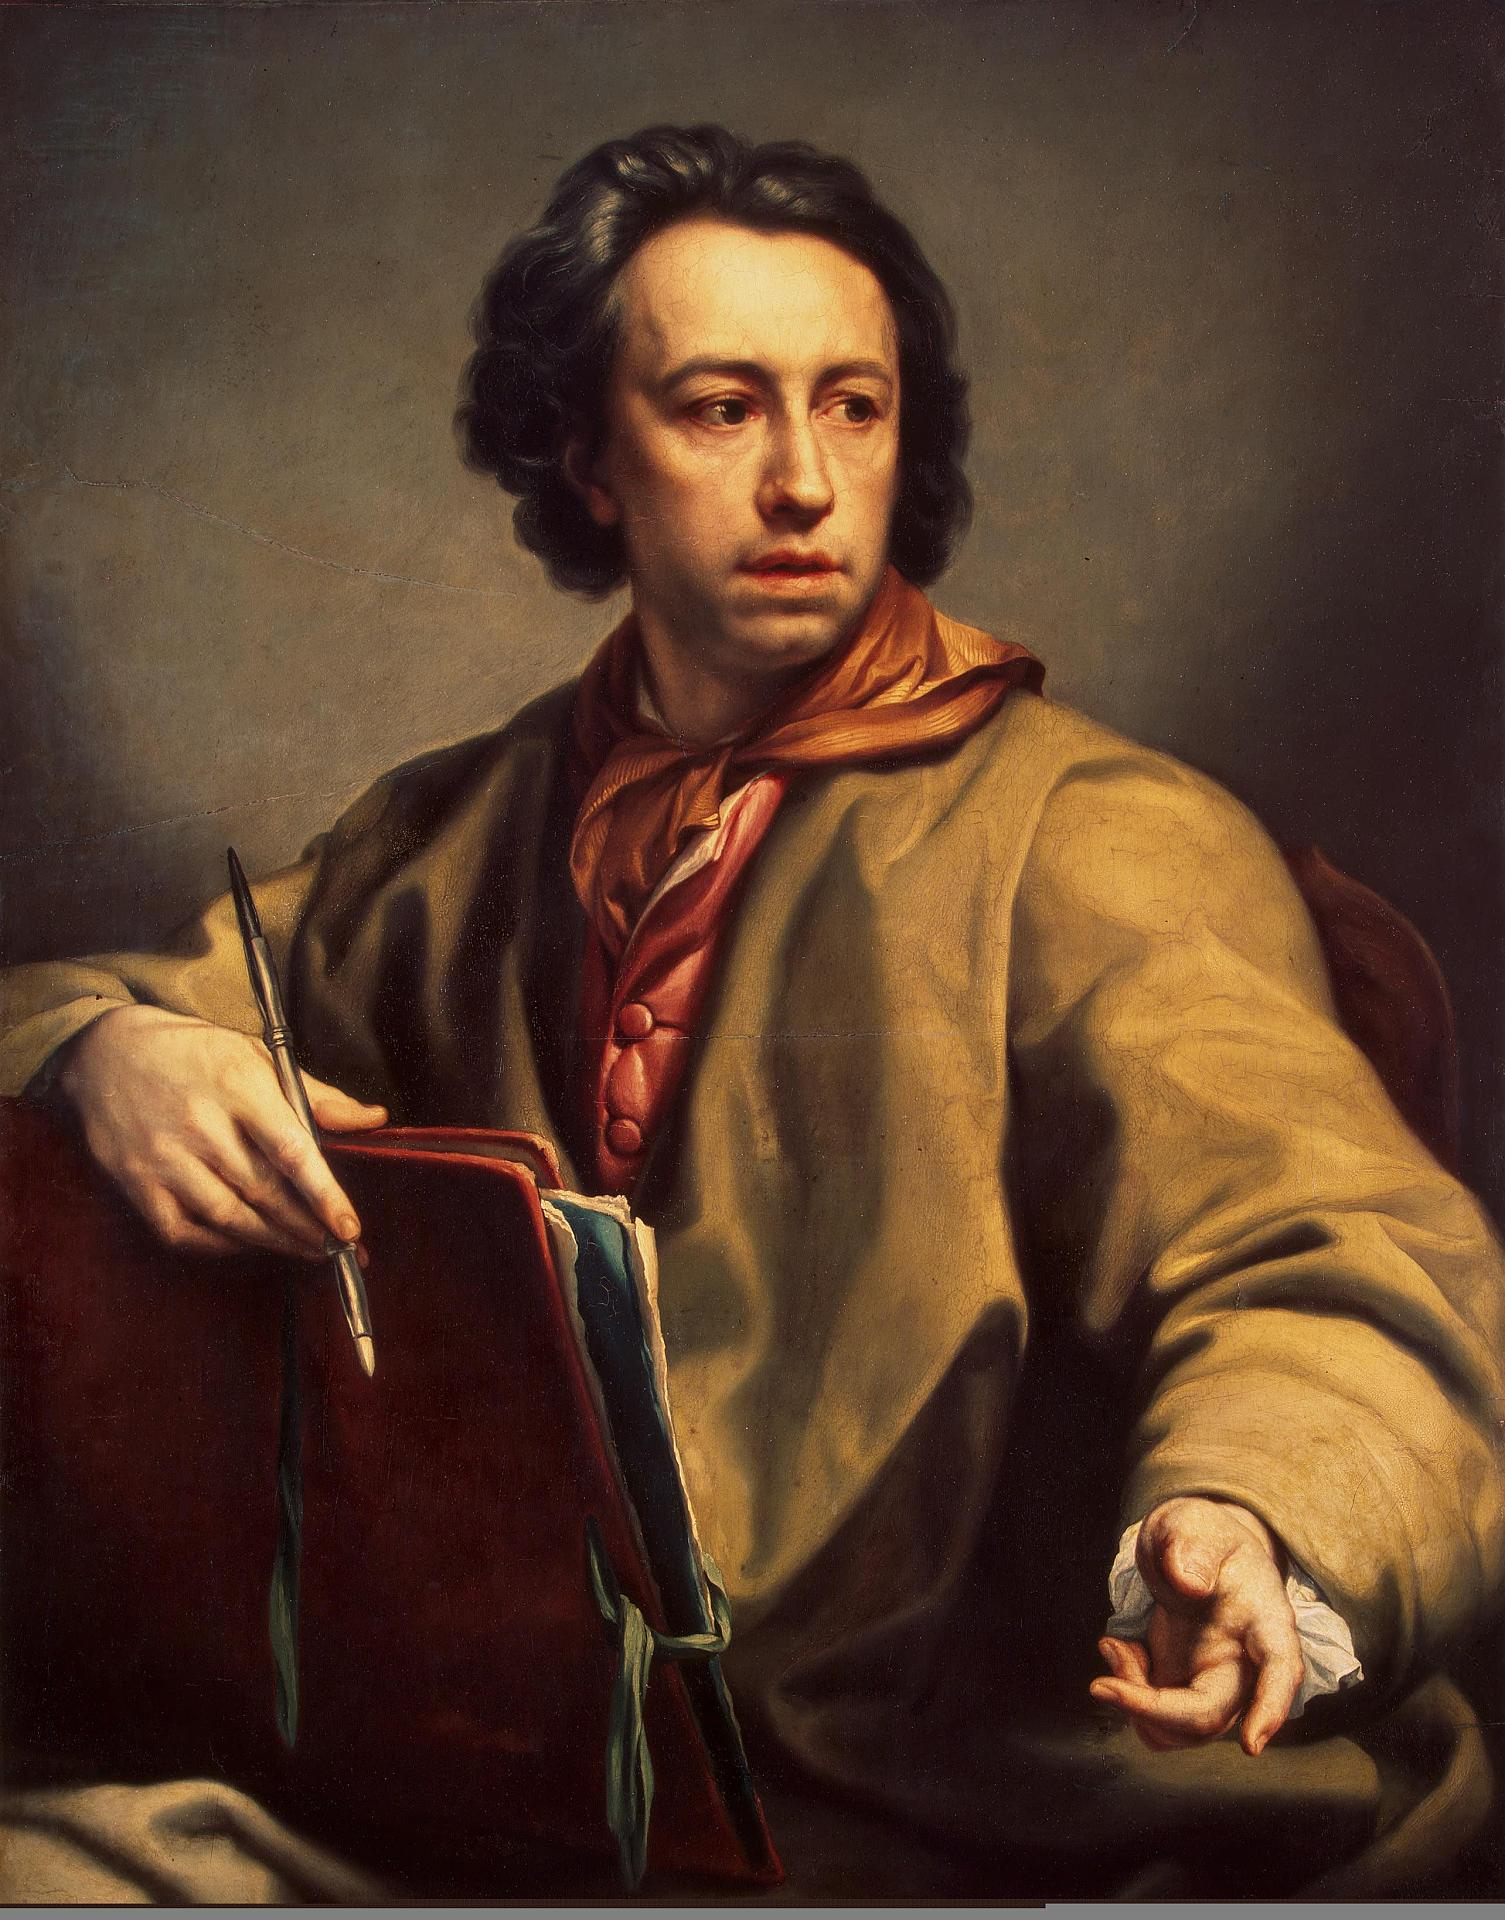 Anton_Raphael_Mengs_-_Self-Portrait_-_WGA15040